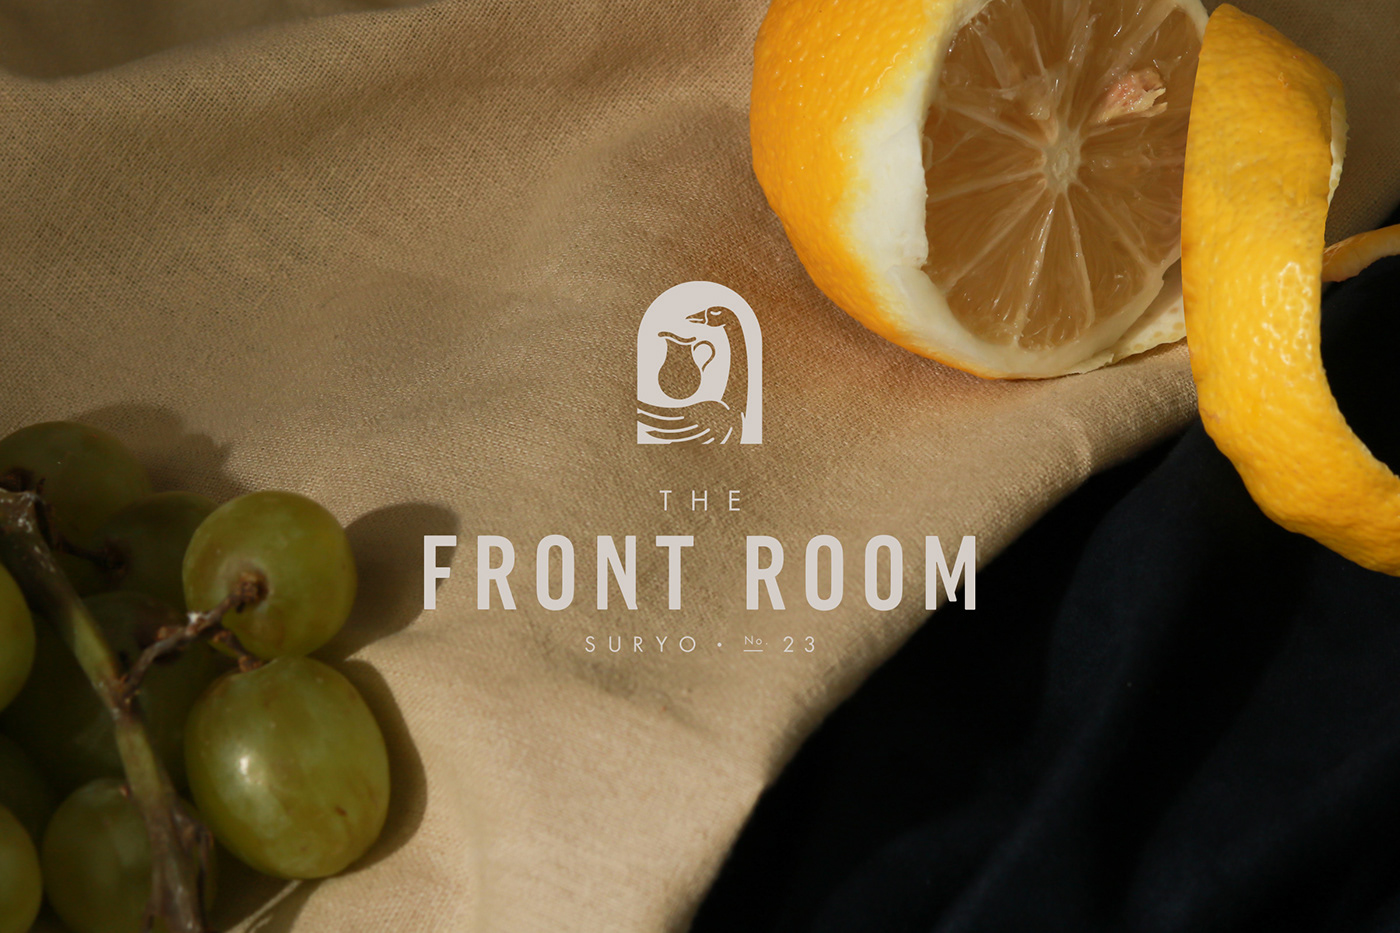 Image may contain: food, lemon and citrus